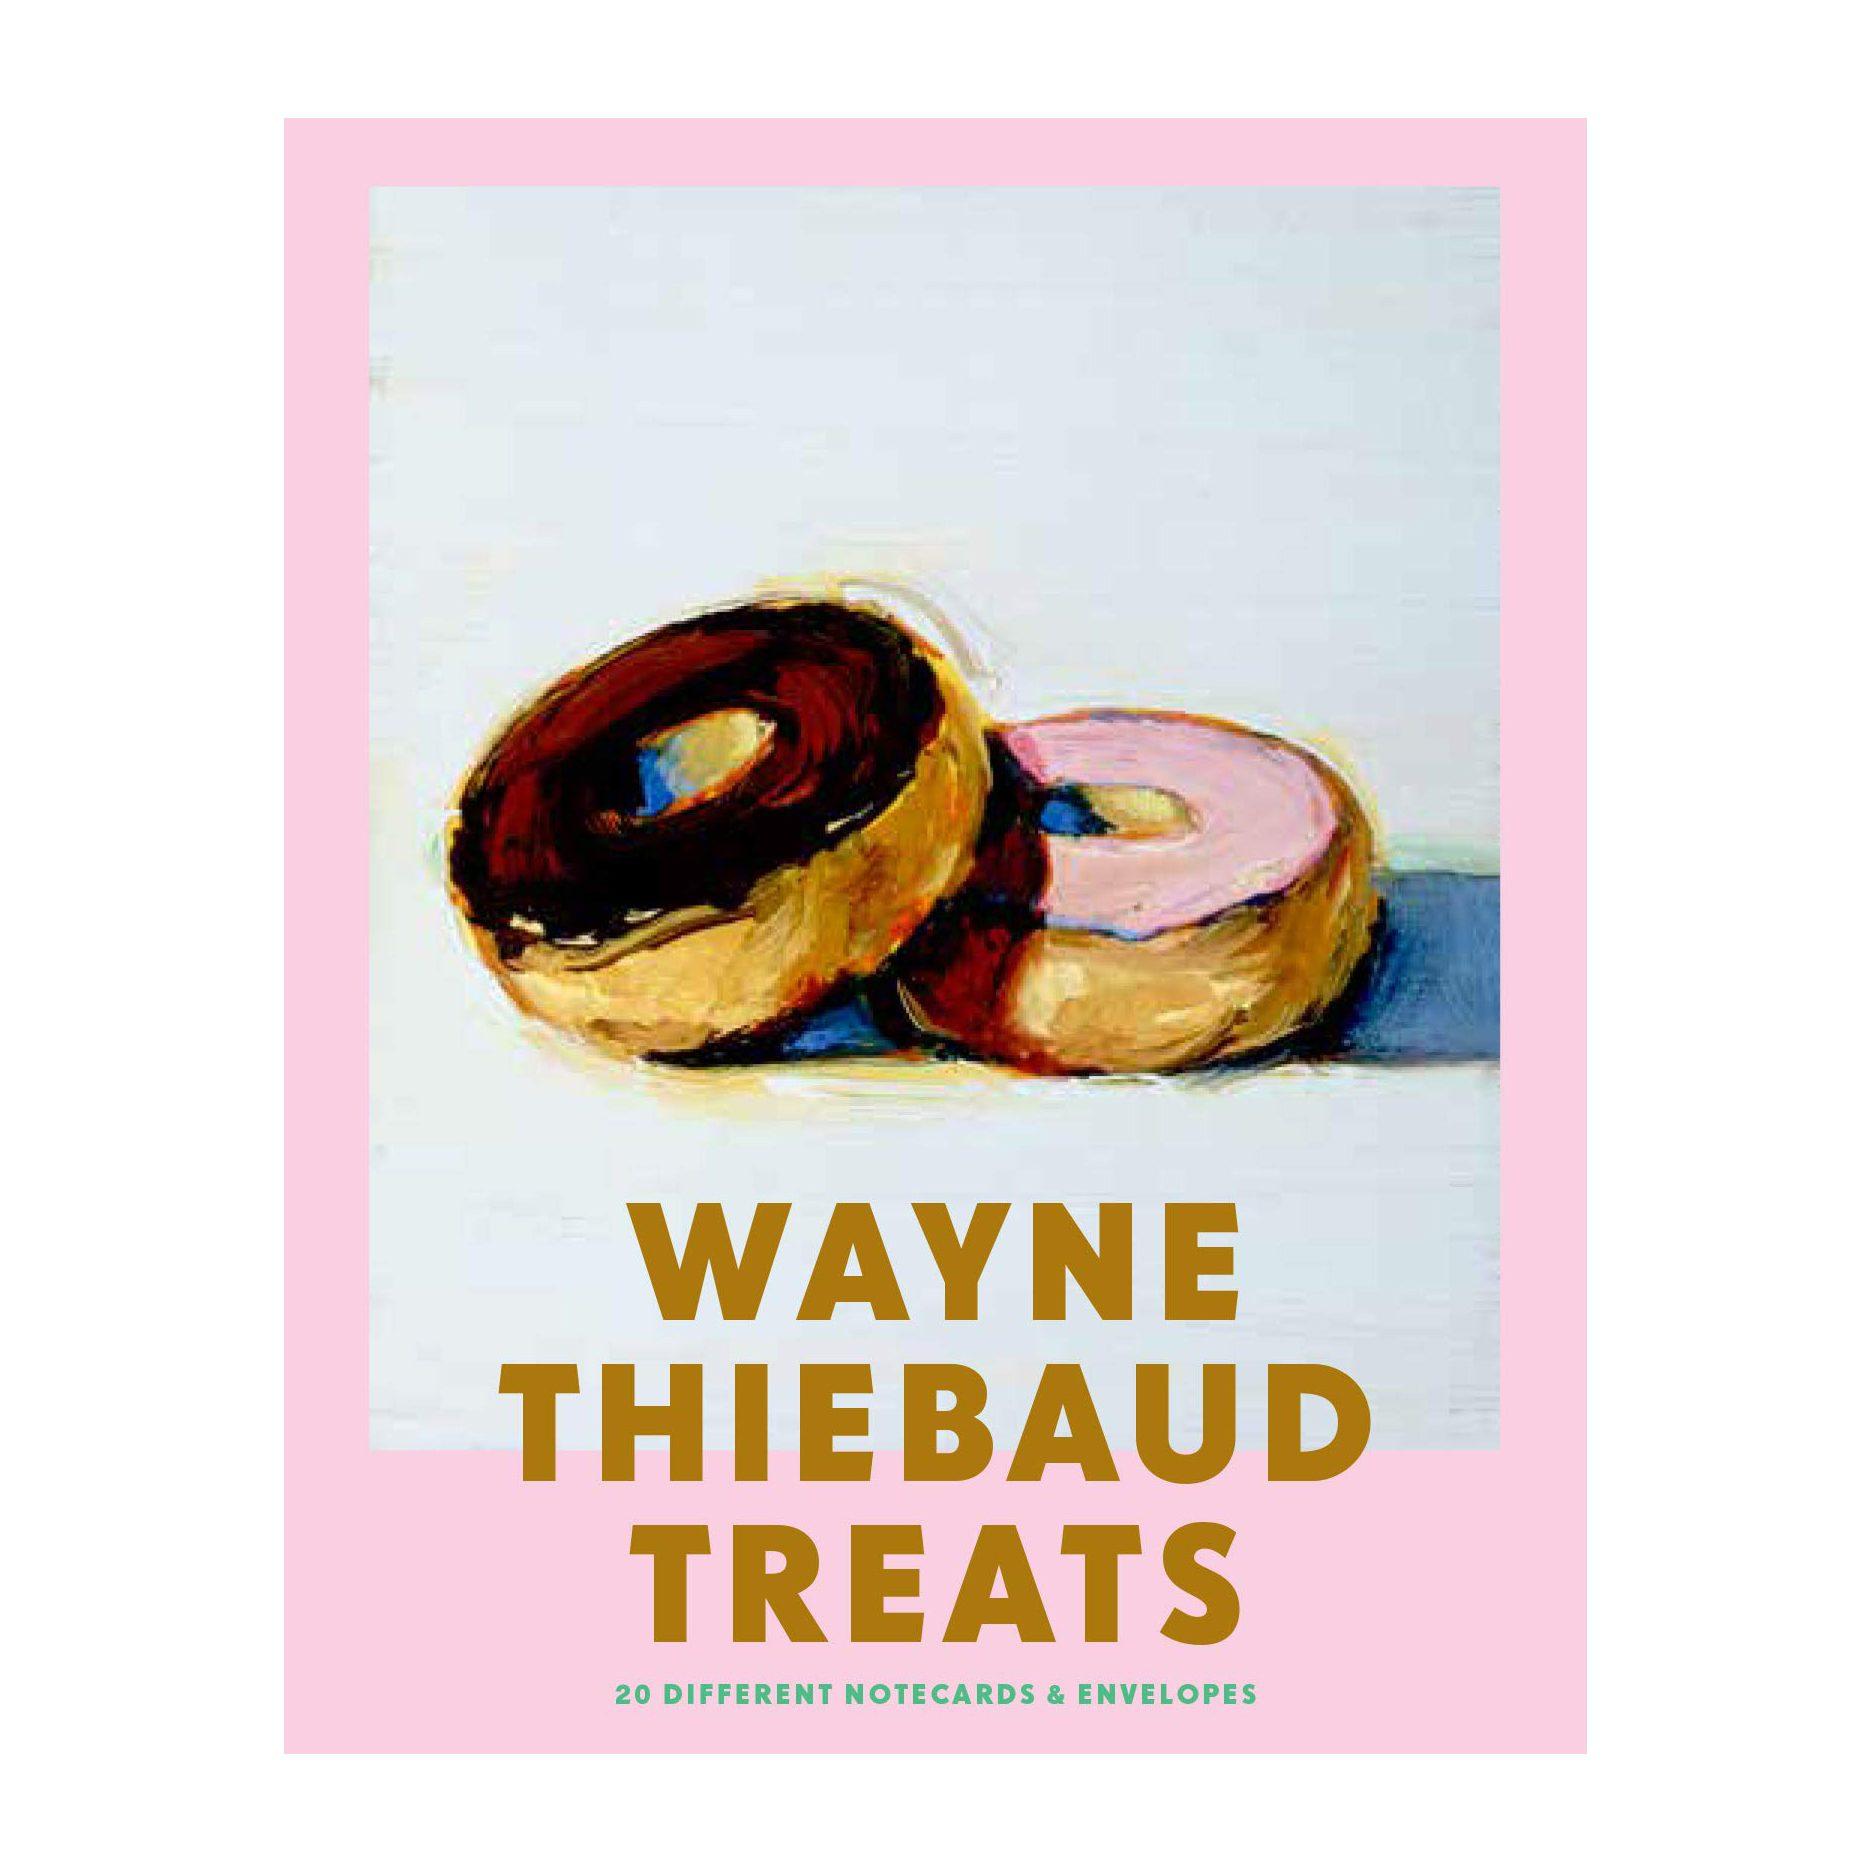 Wayne Thiebaud Treats Notecards for grandma